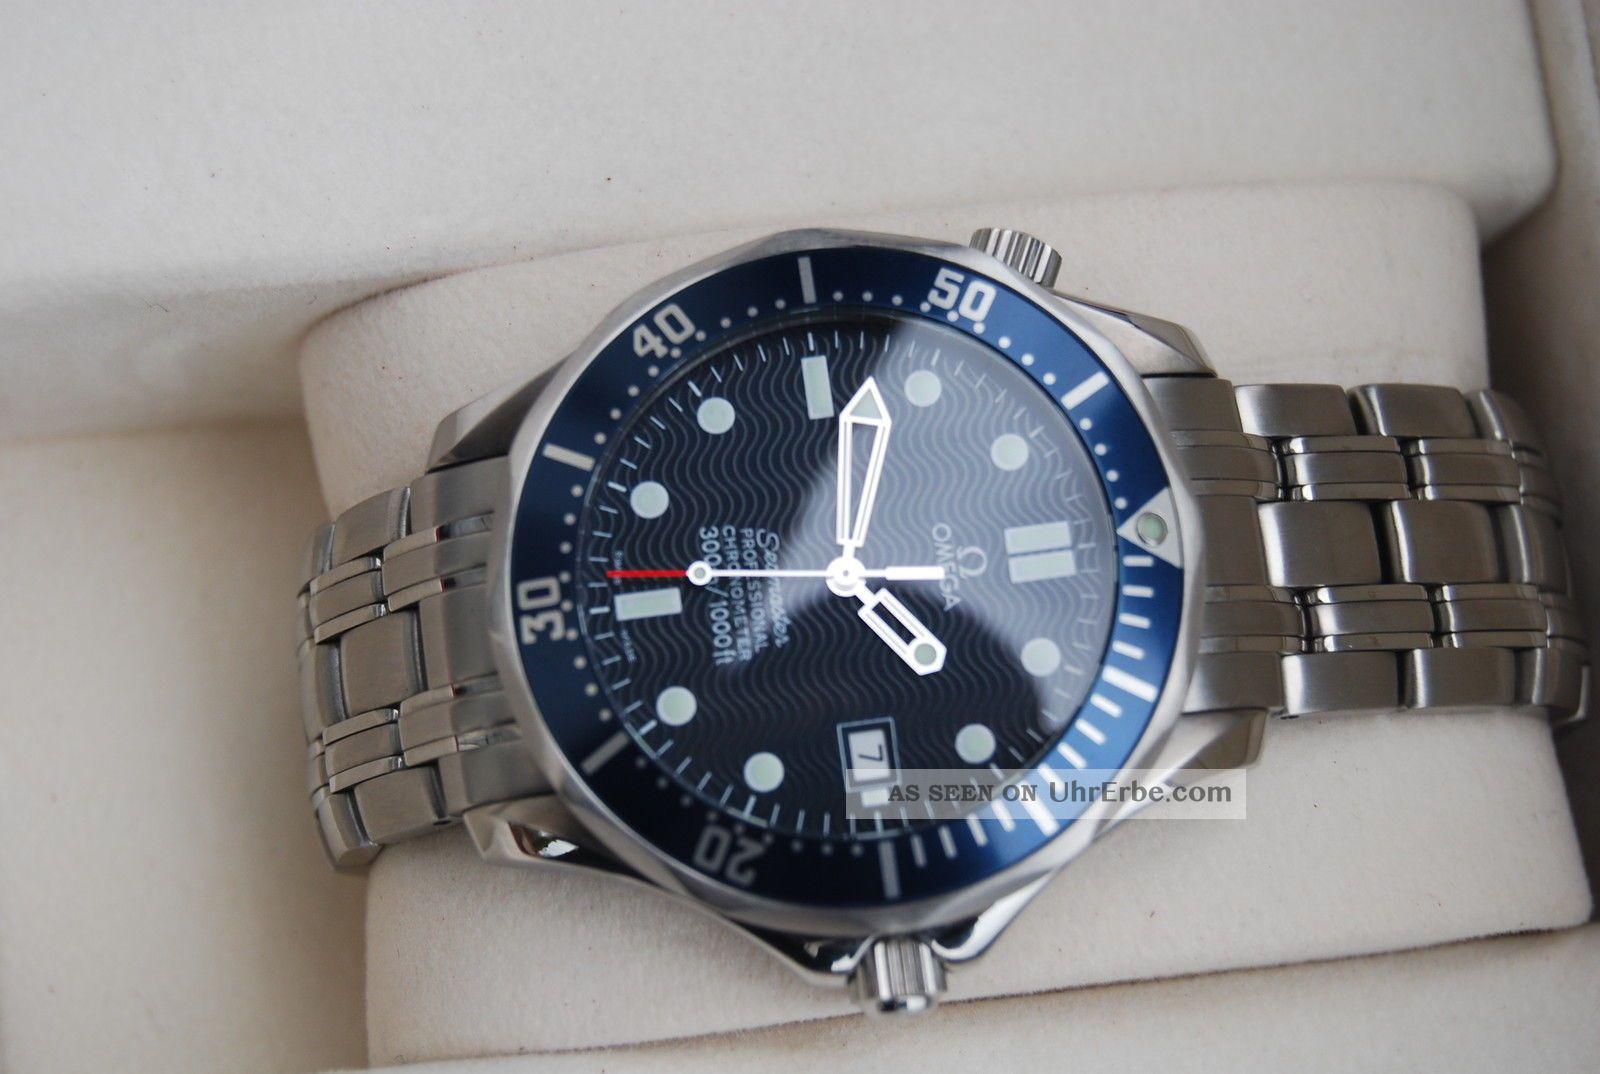 Nos Omega Seamaster Professional Chronometer Automatic 300m Diver James Bond Armbanduhren Bild